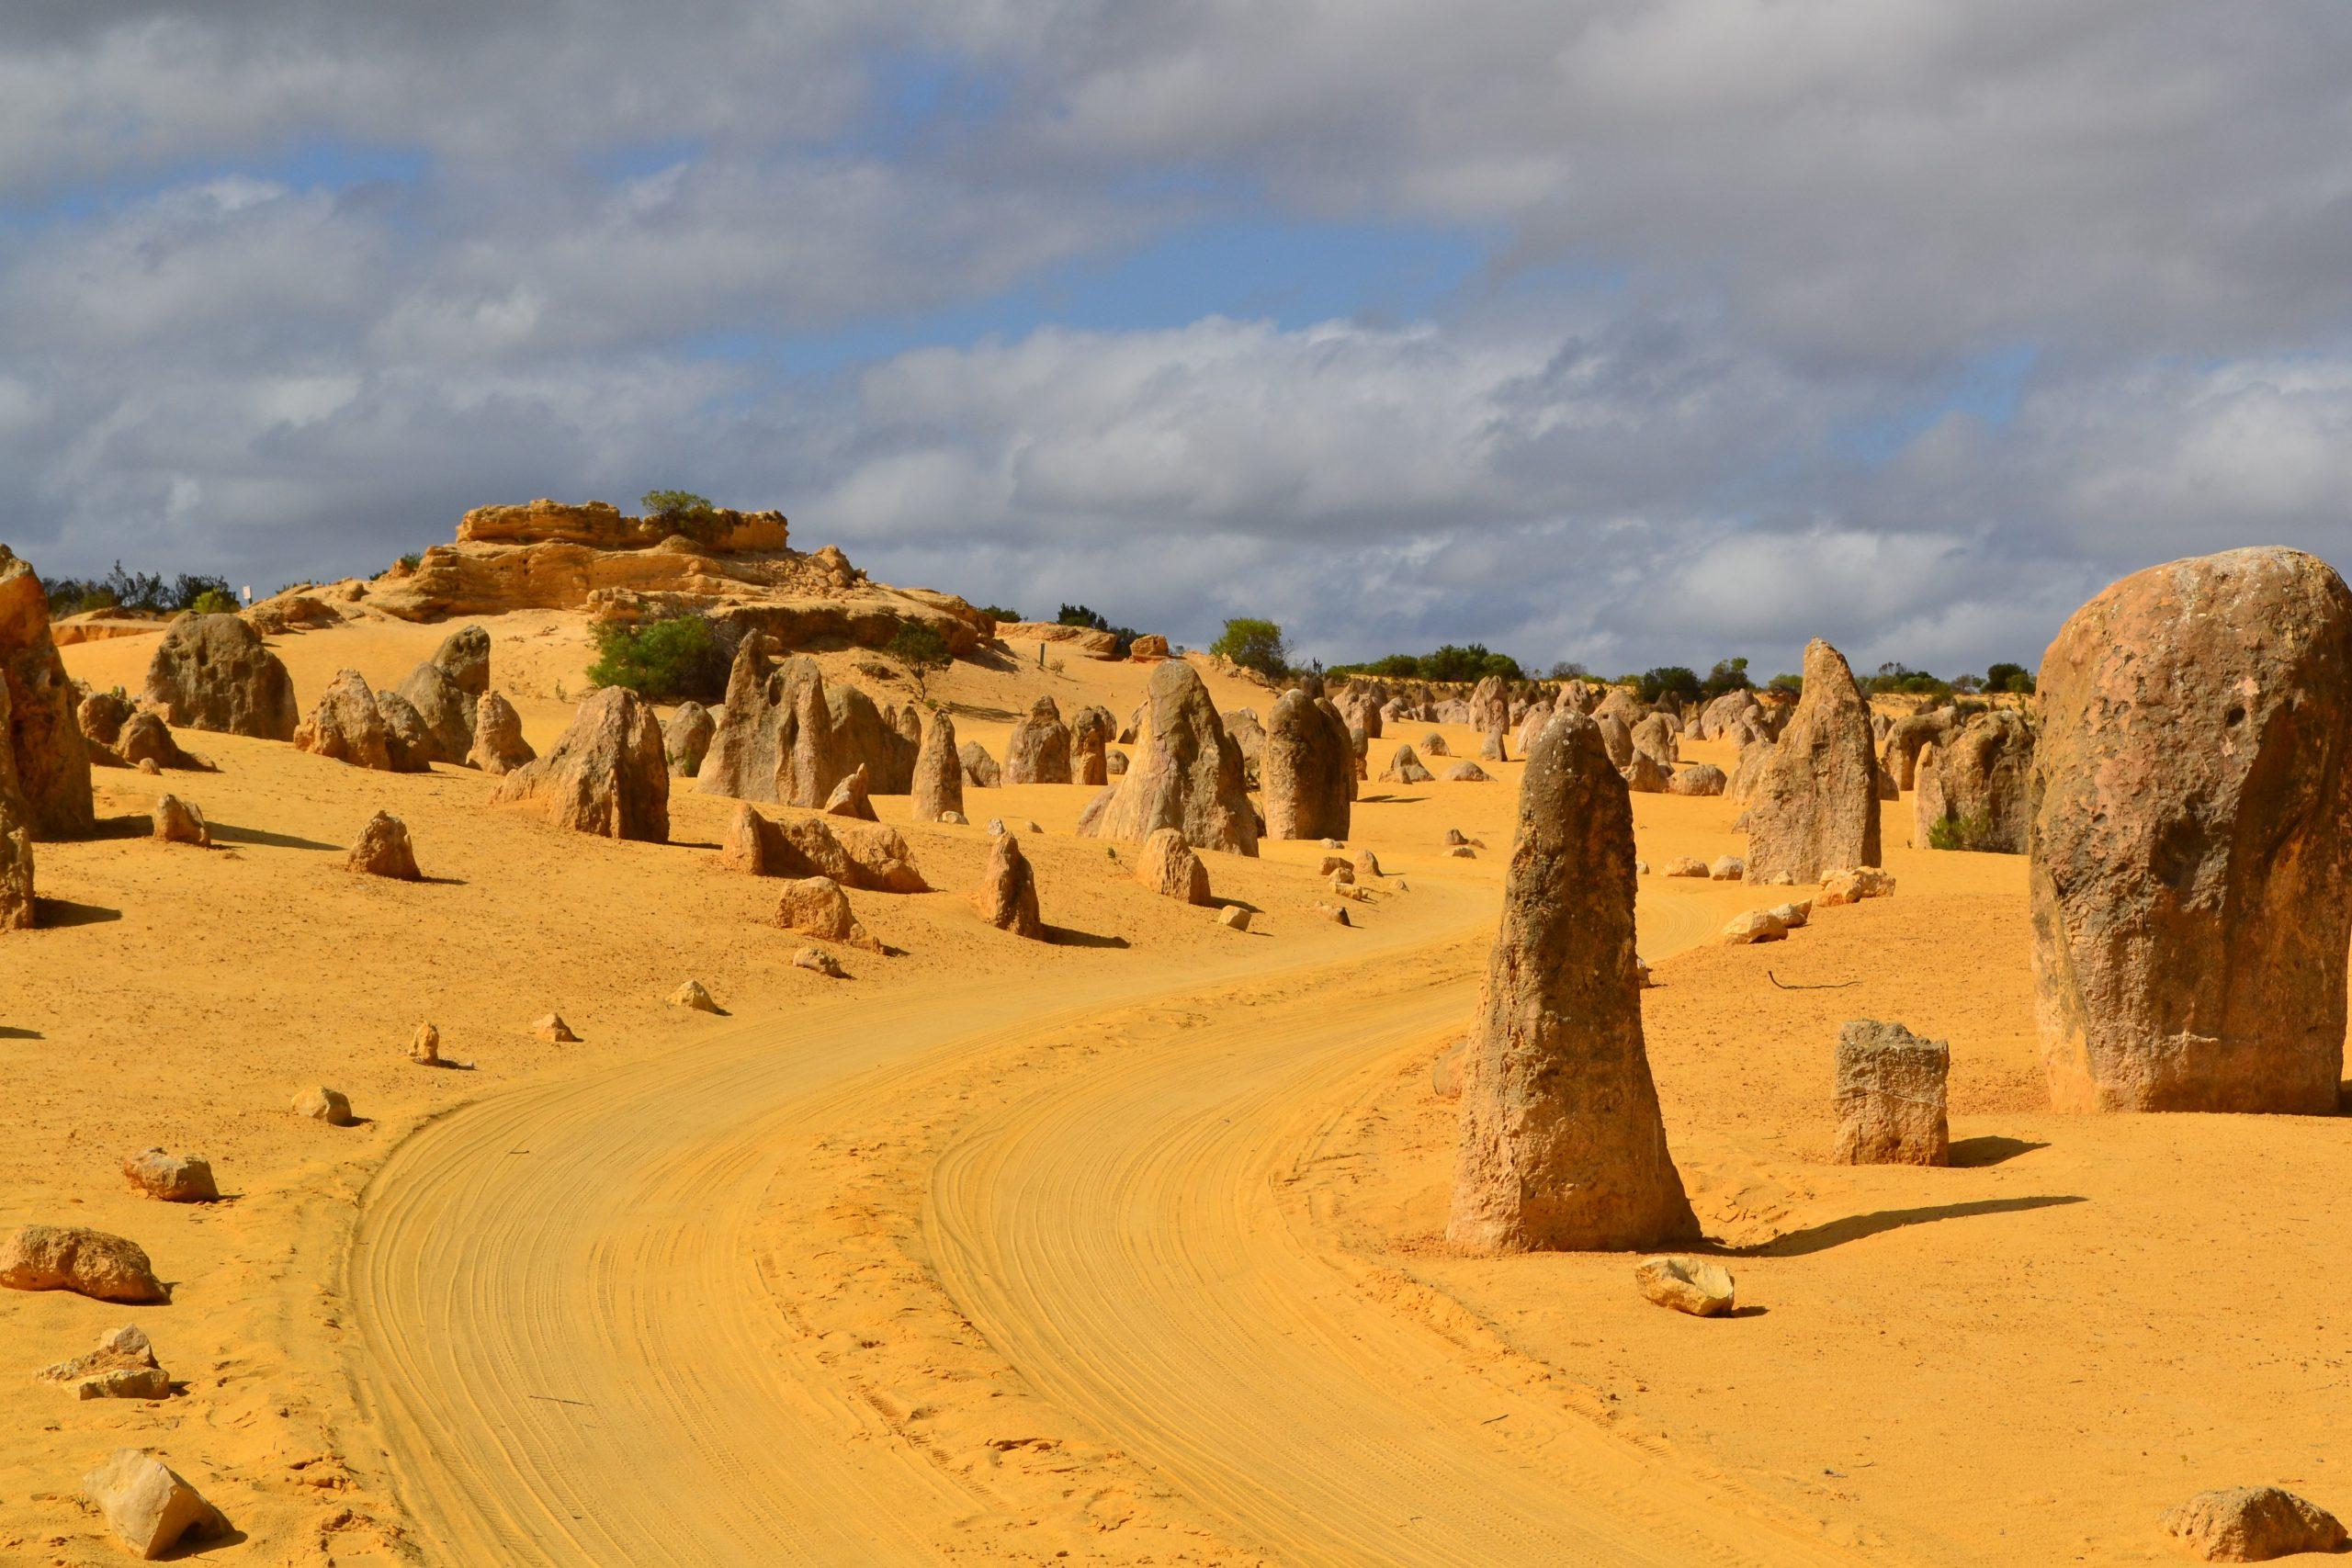 De Pinnacles in Nambung National Park, West-Australië